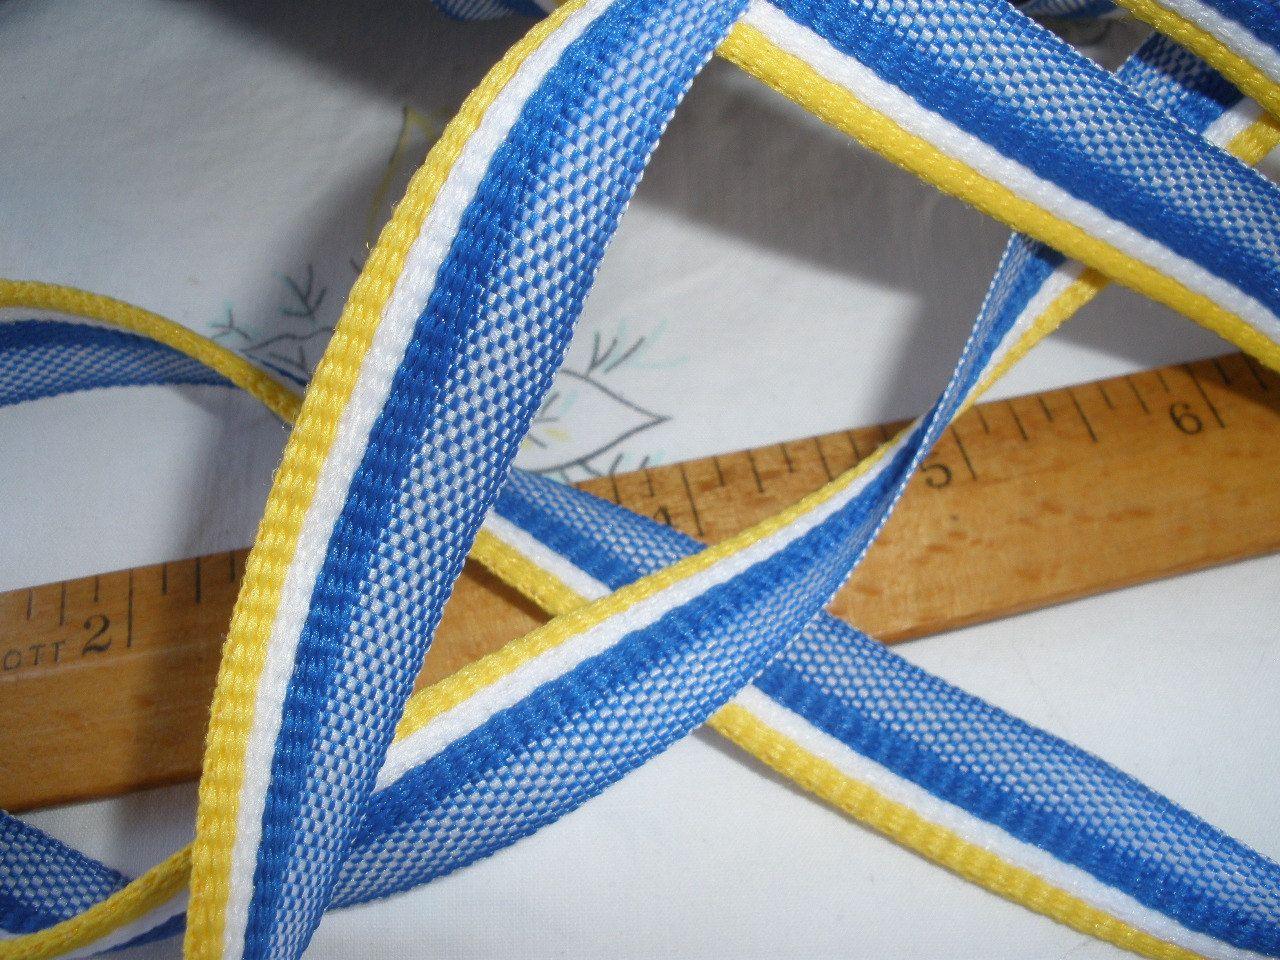 White apron tape - Items Similar To Flat X 3 Piping Trim Lip Cord Bias Tape Royal Blue Yellow White Lip Edging Crazy Quilt Pillows Yards Yardage Embellish Apron Tape On Etsy